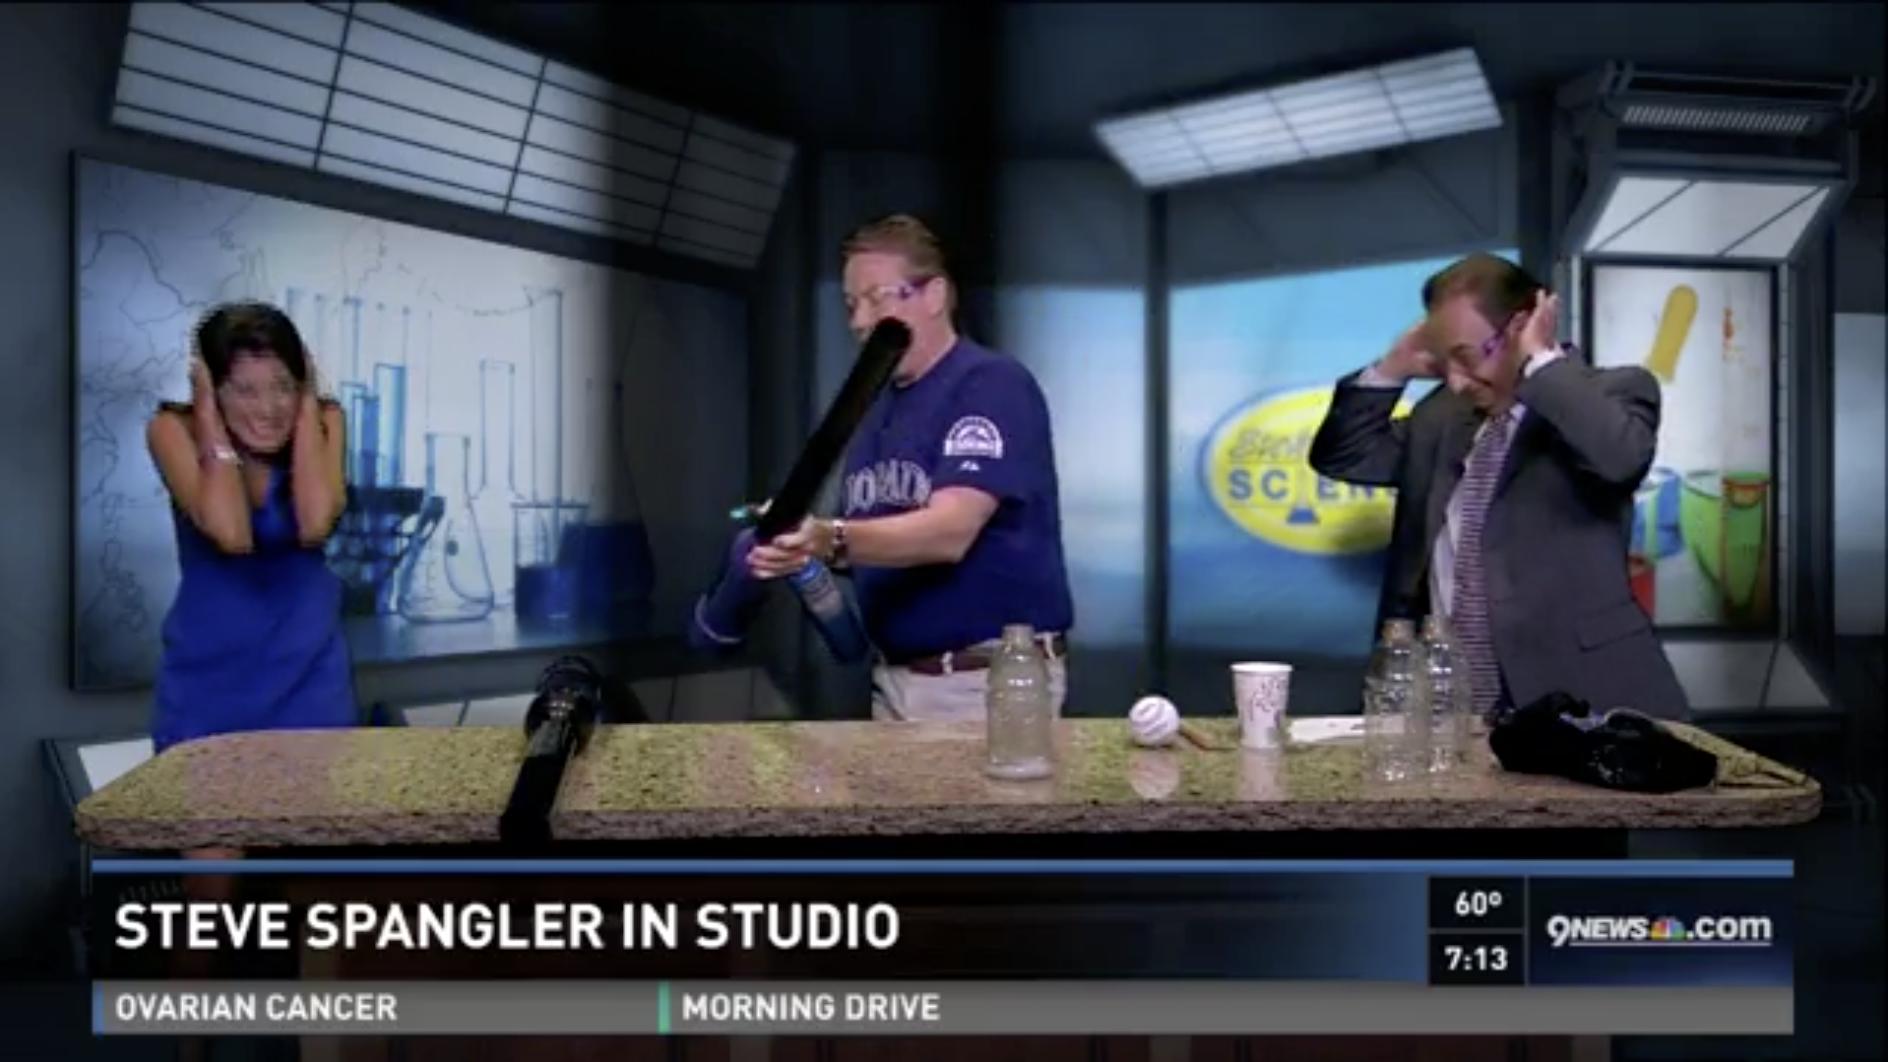 Steve Spangler First Pitch Science